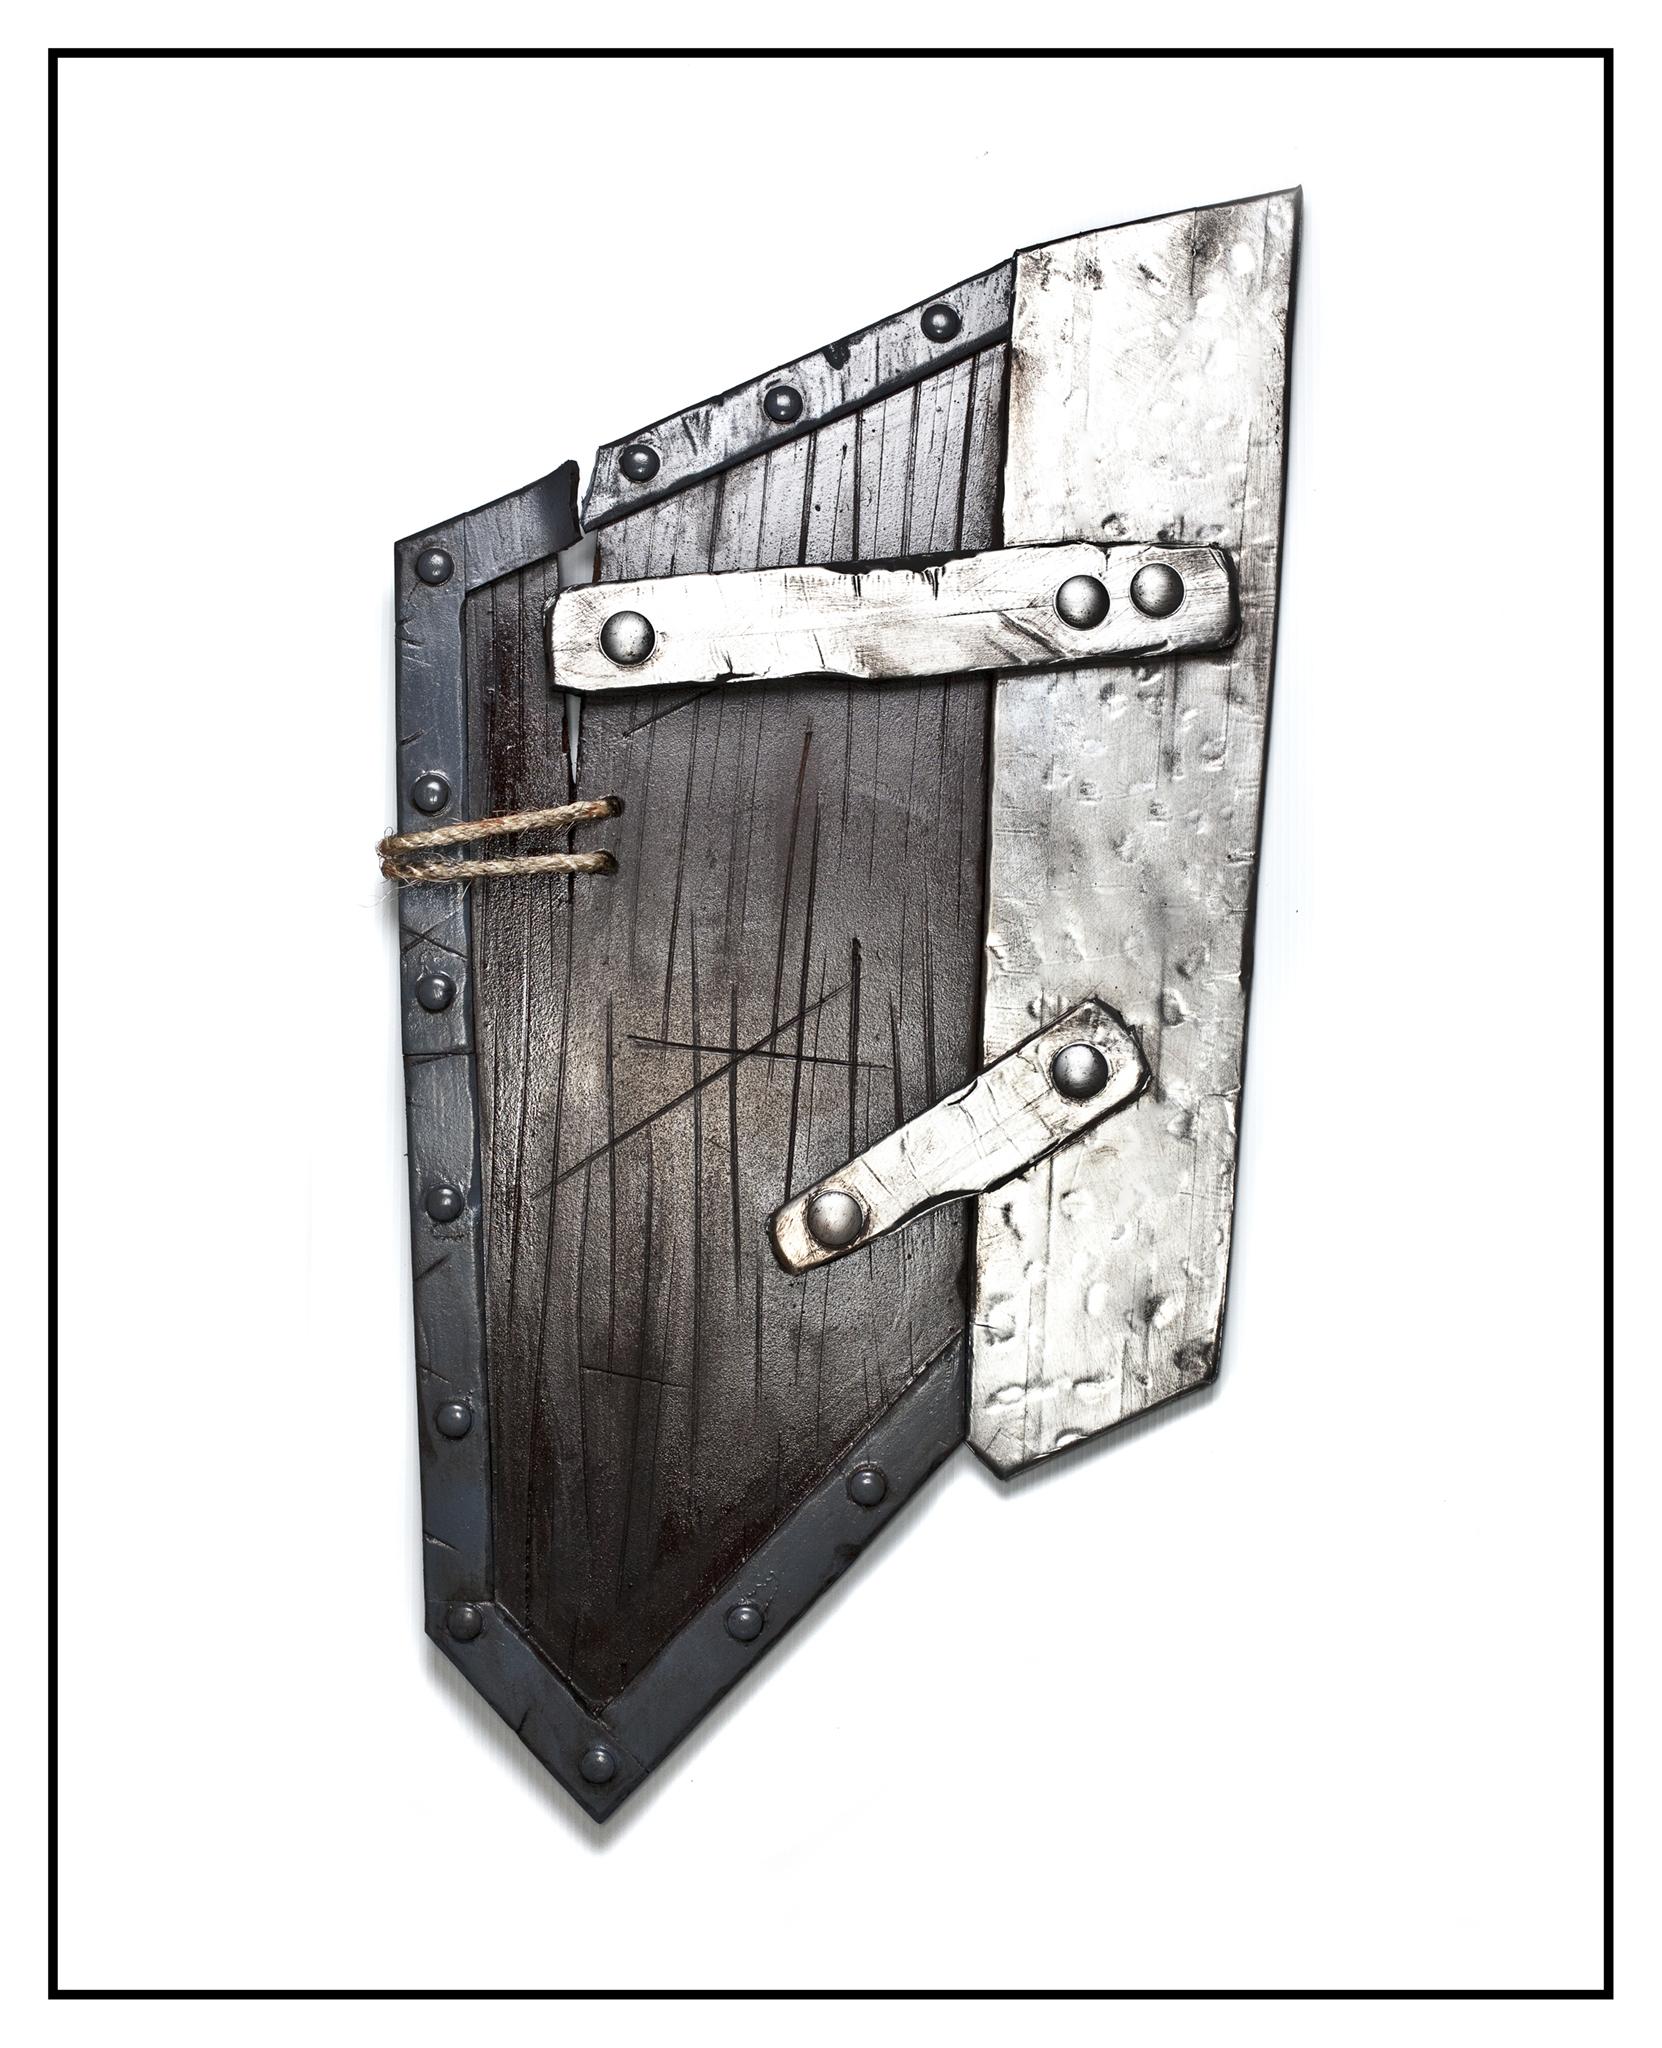 hyborian shield angled.jpg